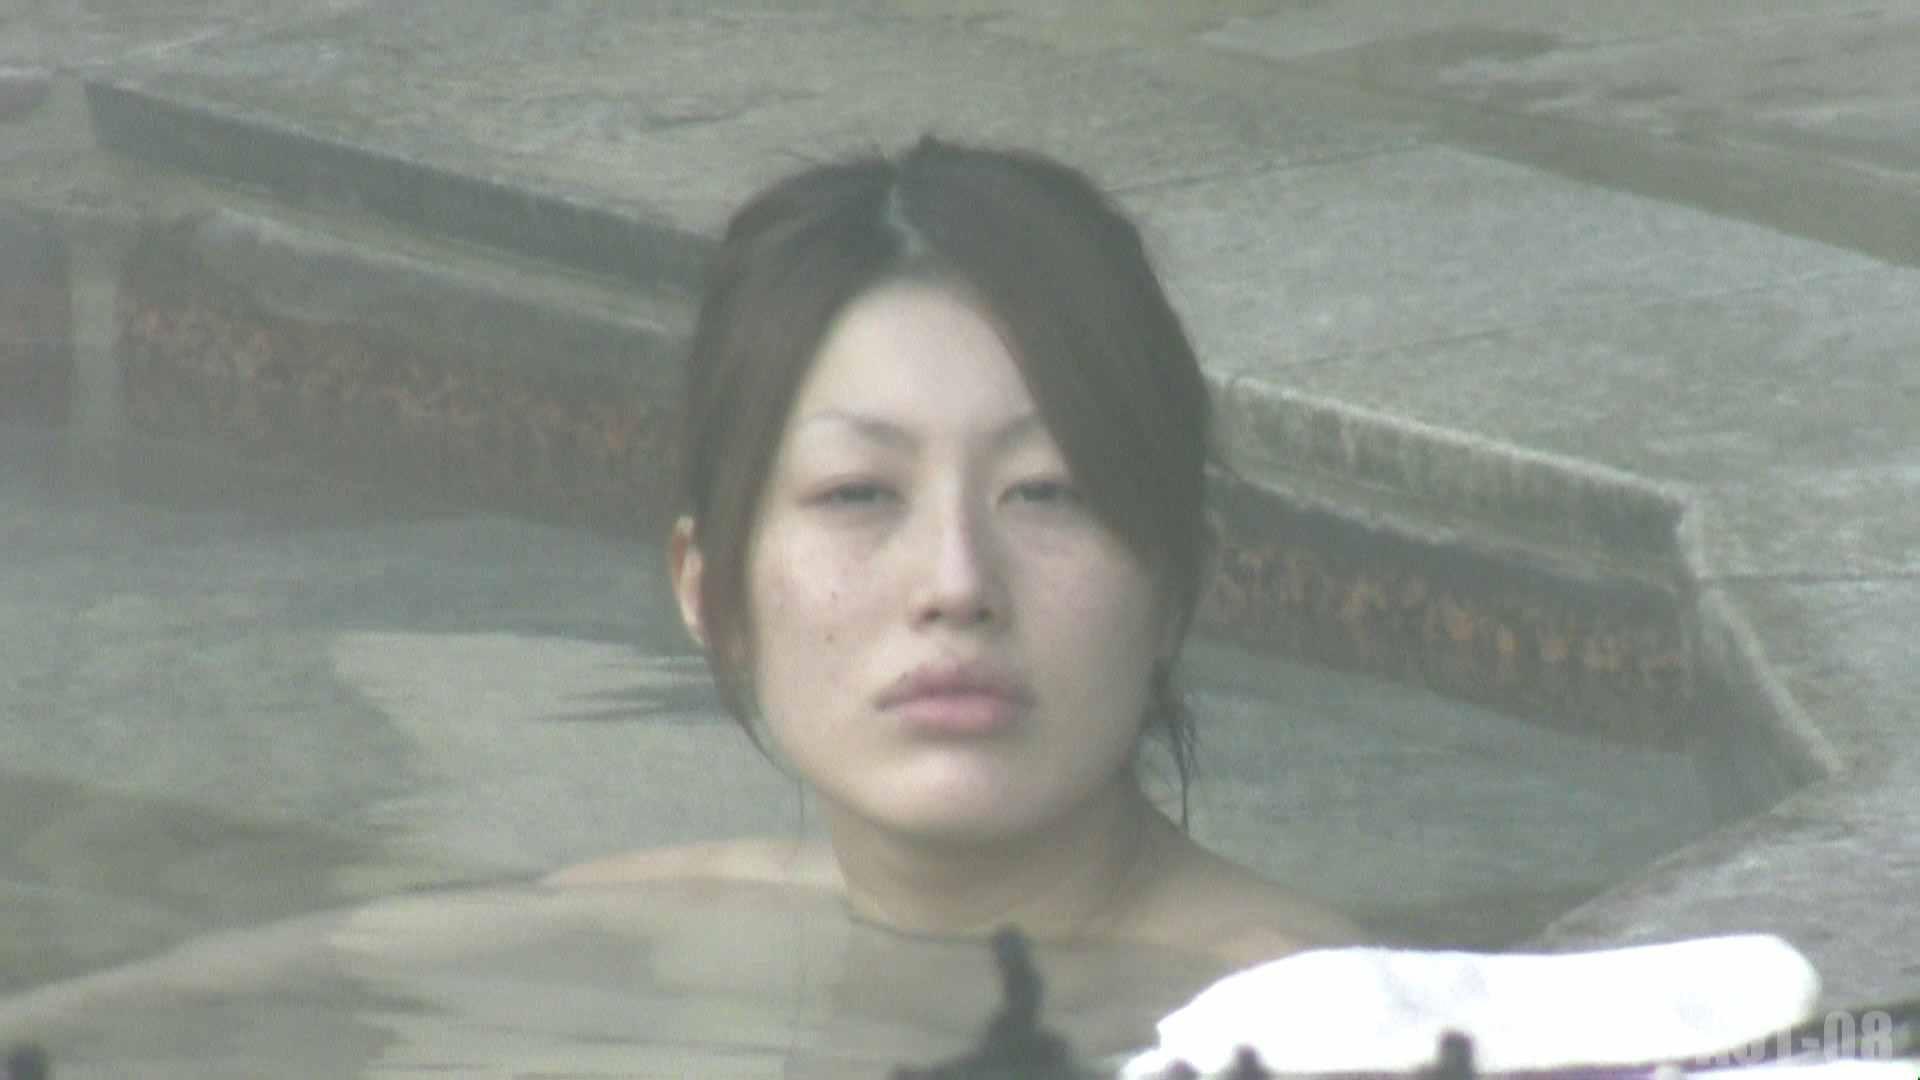 Aquaな露天風呂Vol.775 露天風呂編  78PIX 44